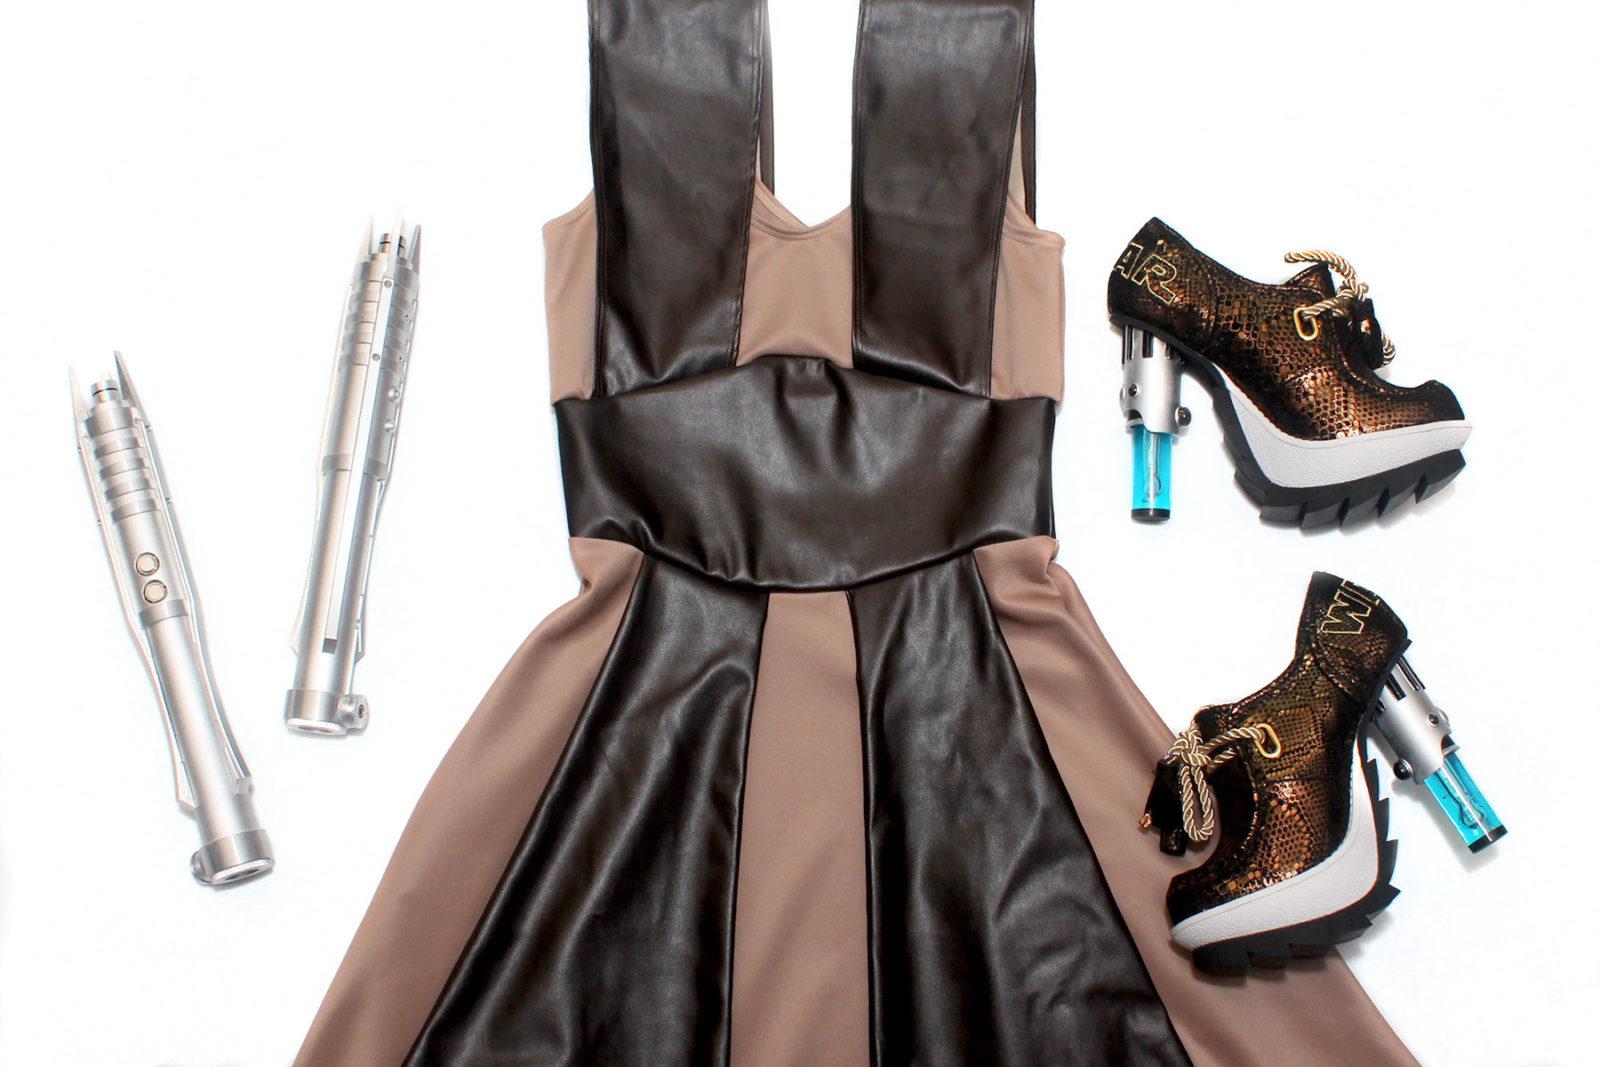 Review – Elhoffer Design Galactic Knight dress